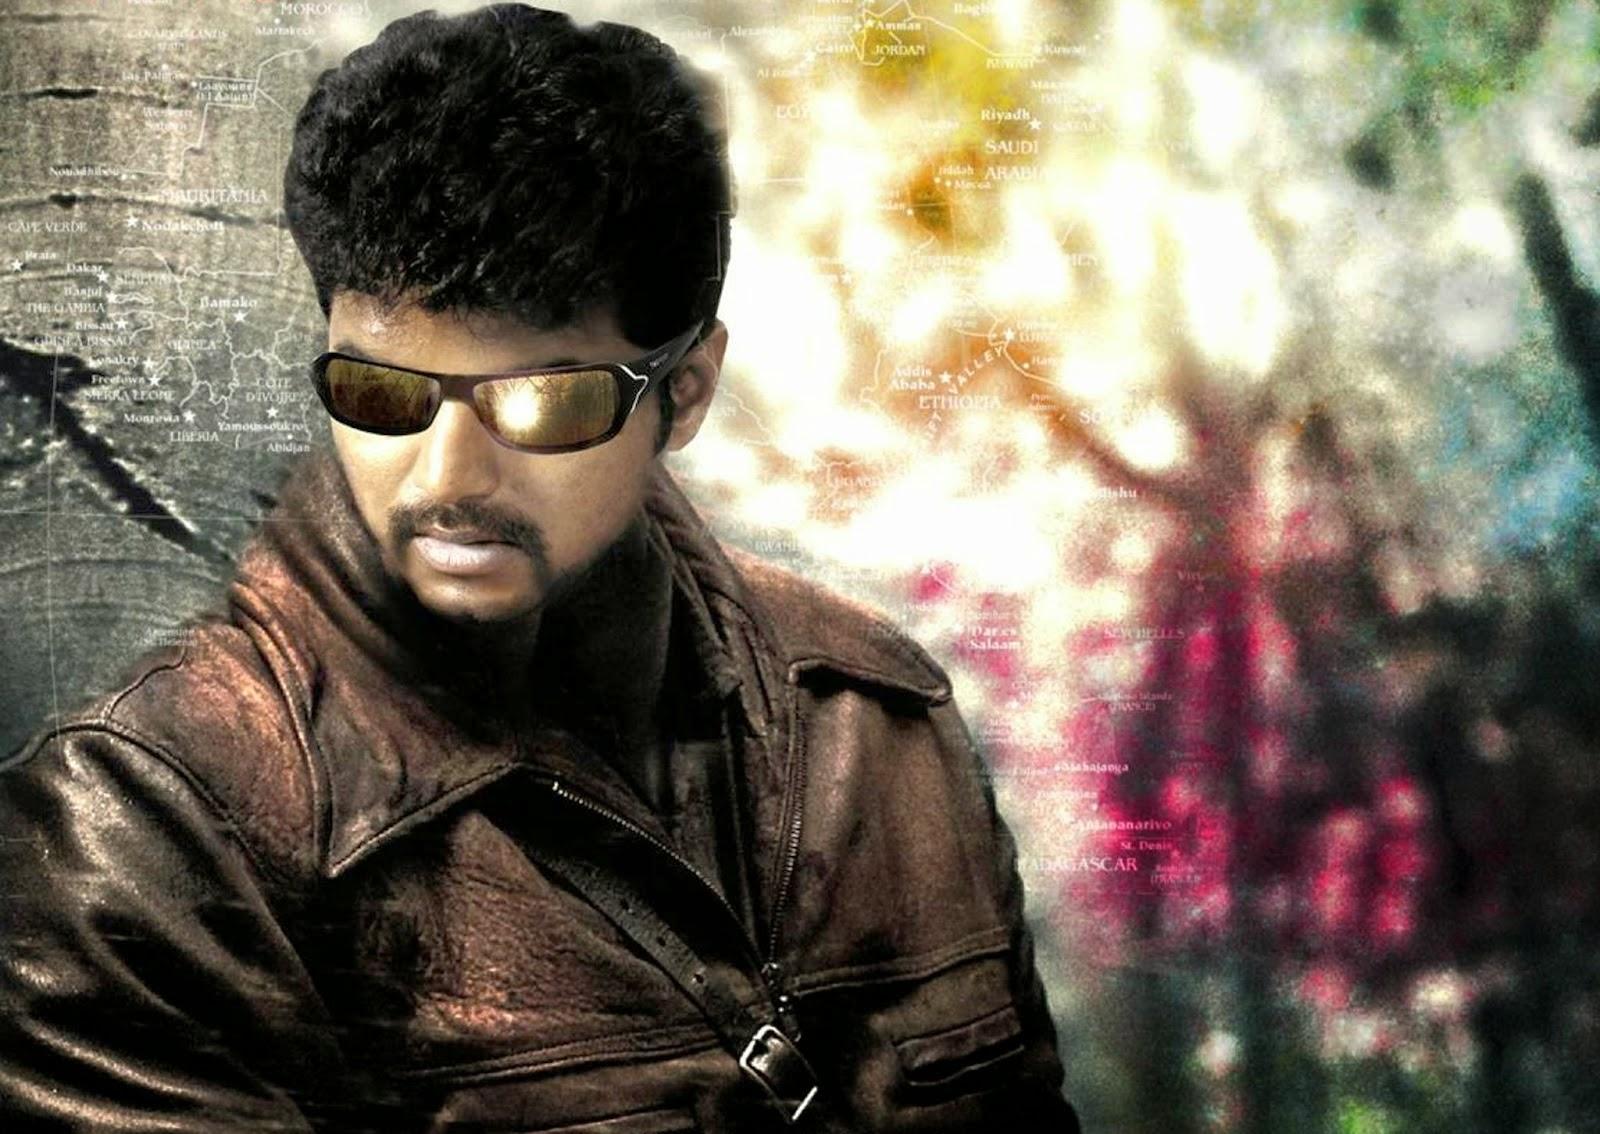 vijay south actor